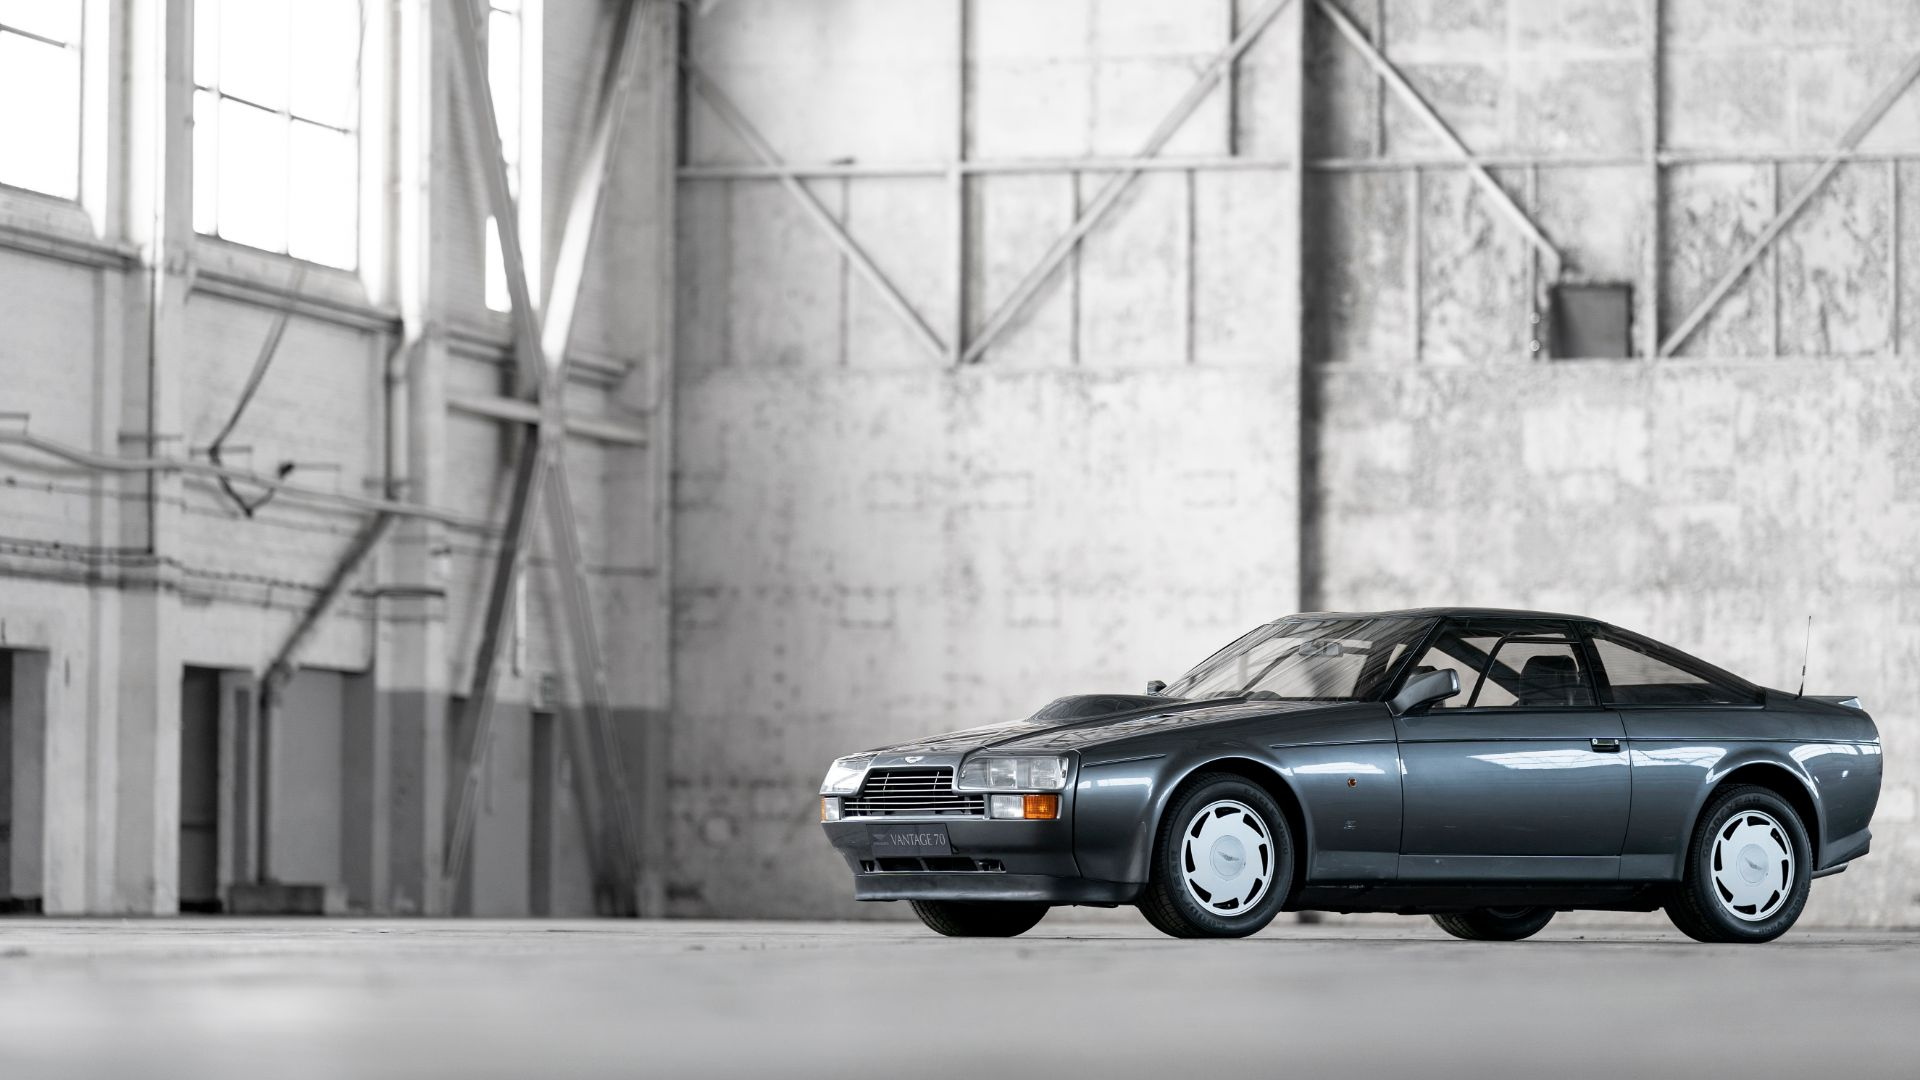 V8 Vantage – Embracing aero, re-introducing Zagato